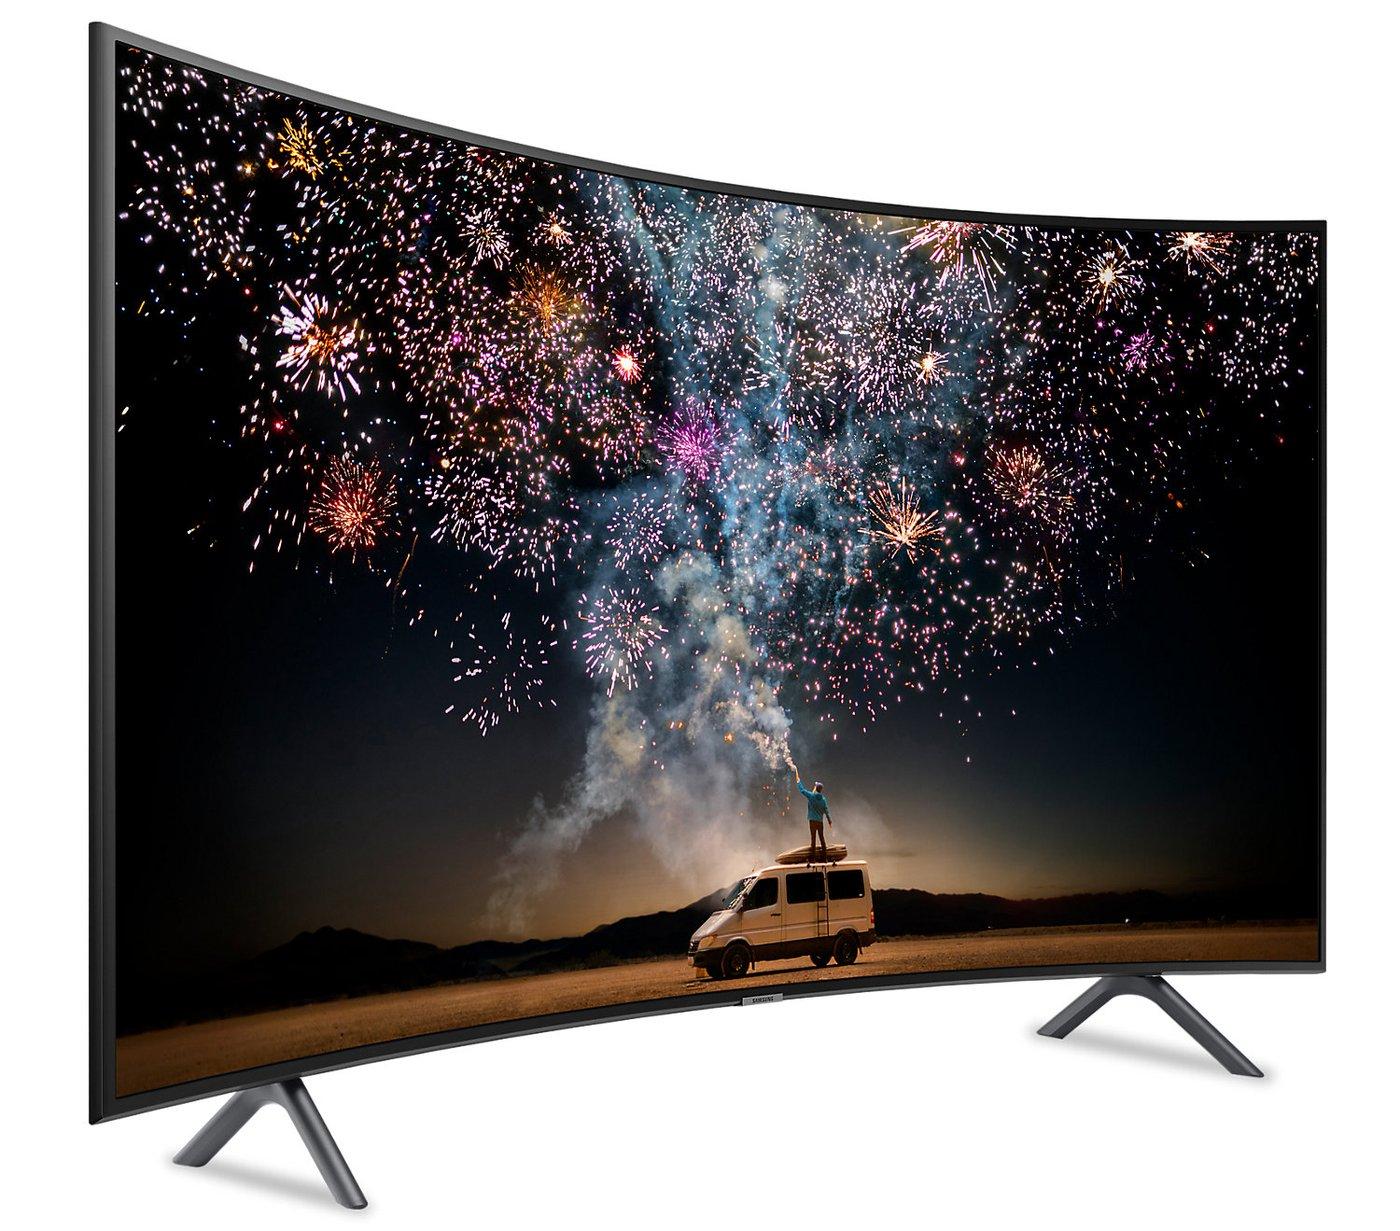 "TV 49"" Samsung UE49RU7305 - LED, 4K UHD, HDR 10+, Incurvé, 1500 PQI, PurColor, Smart TV (Via ODR de 100€)"